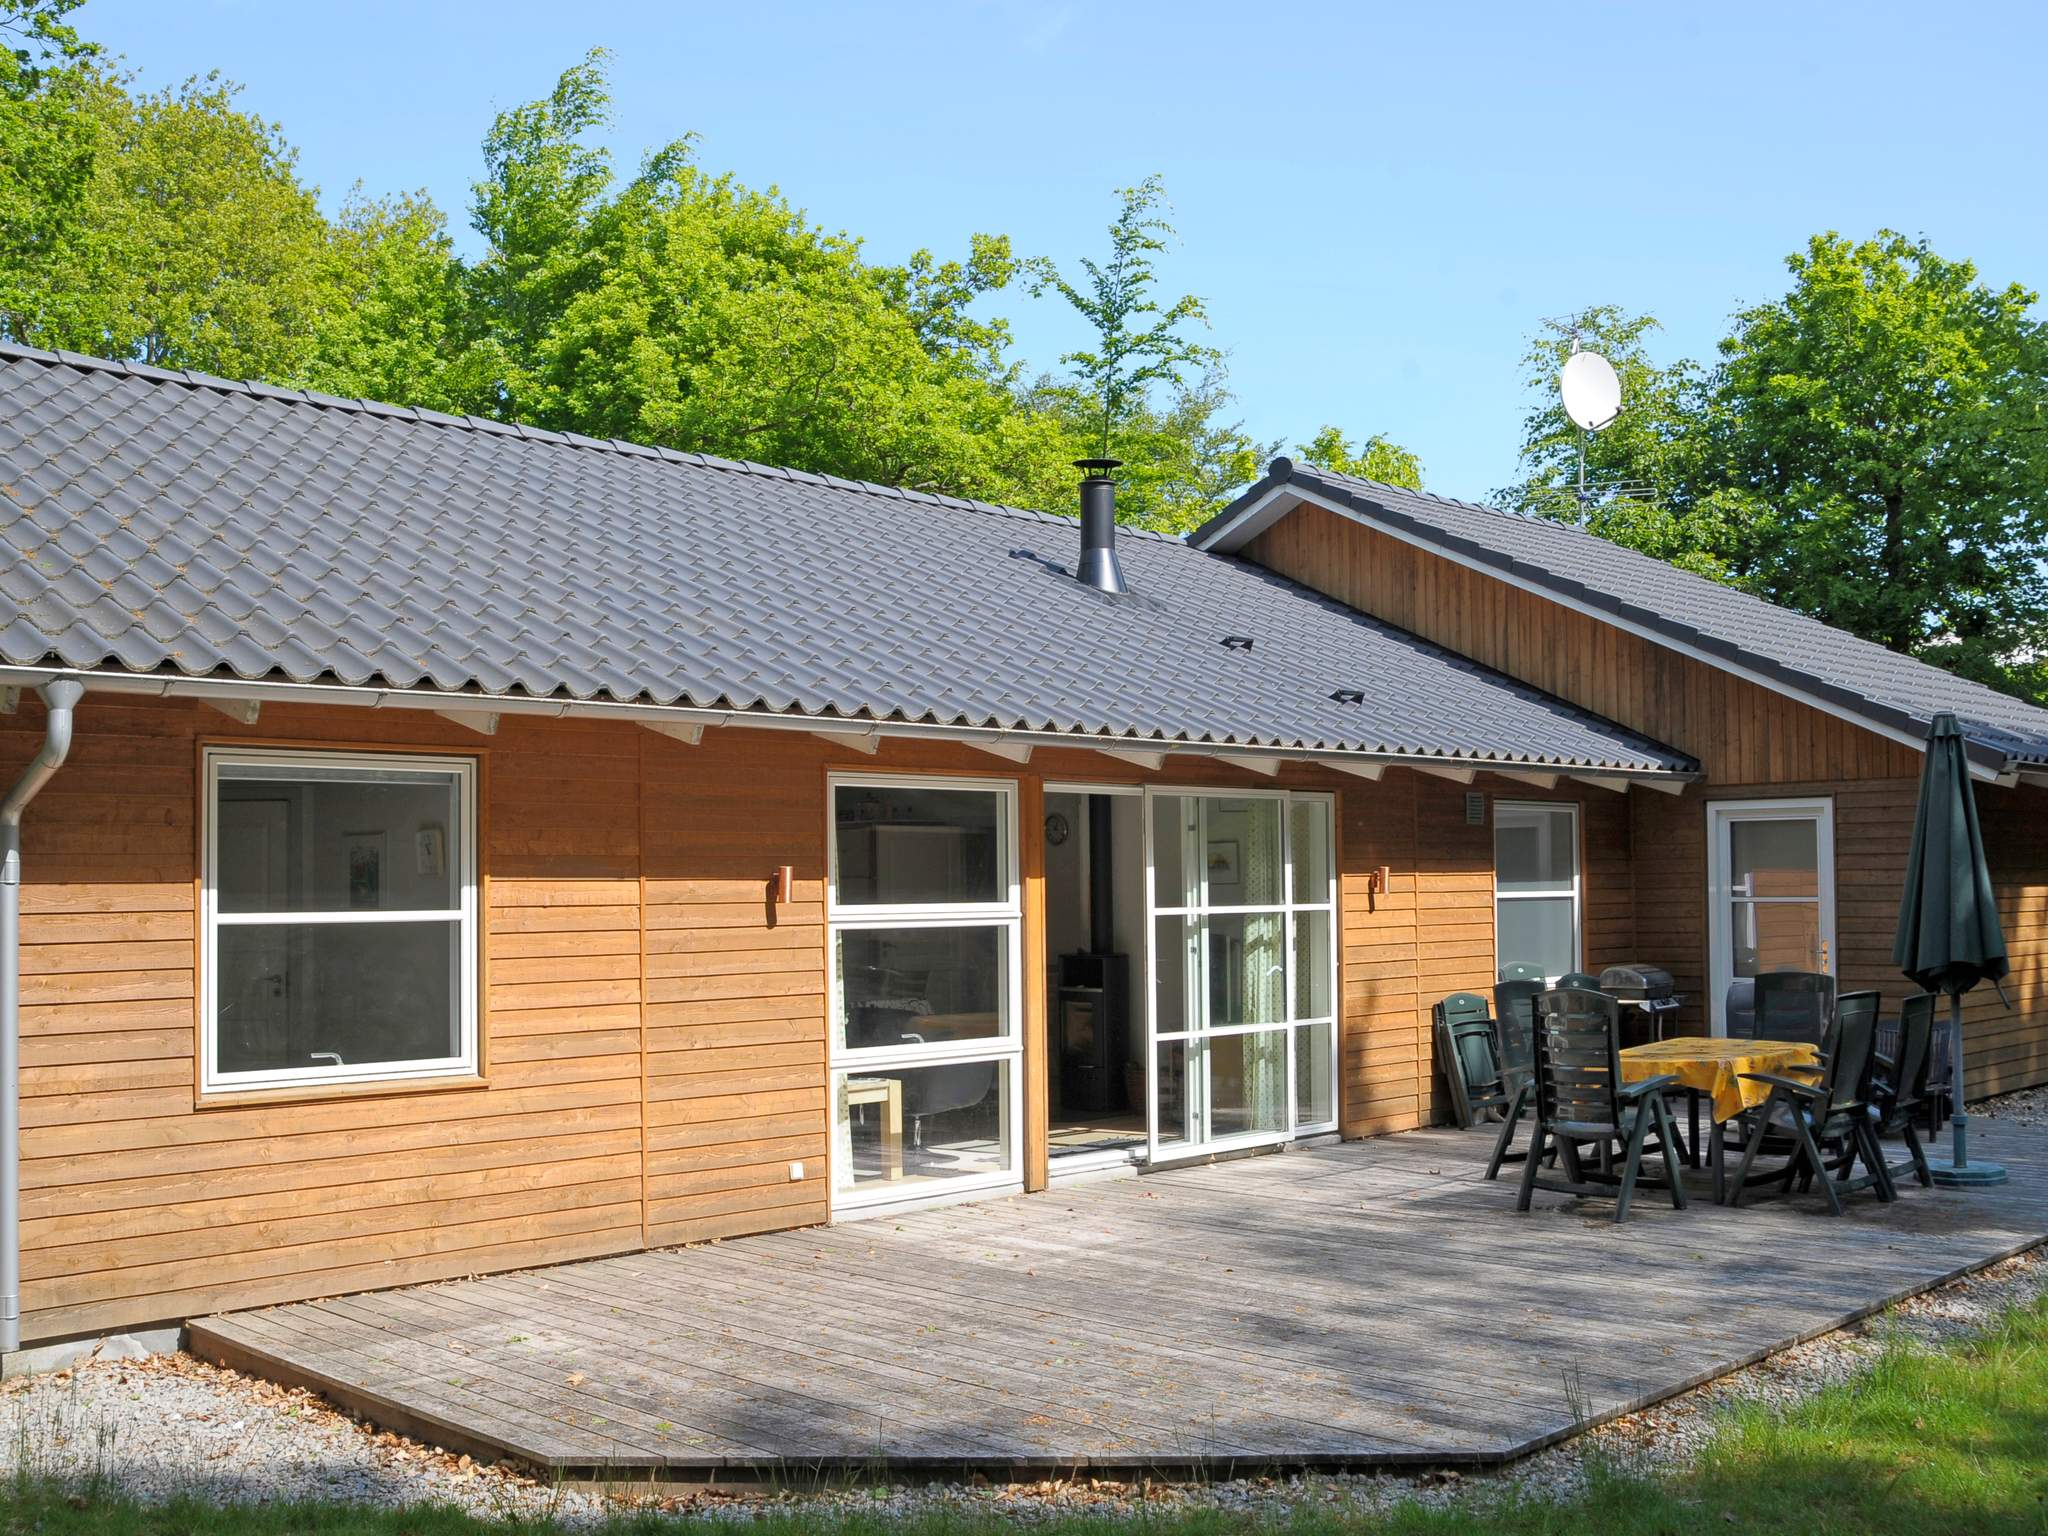 Ferienhaus Fjellerup Strand (315966), Fjellerup, , Ostjütland, Dänemark, Bild 17